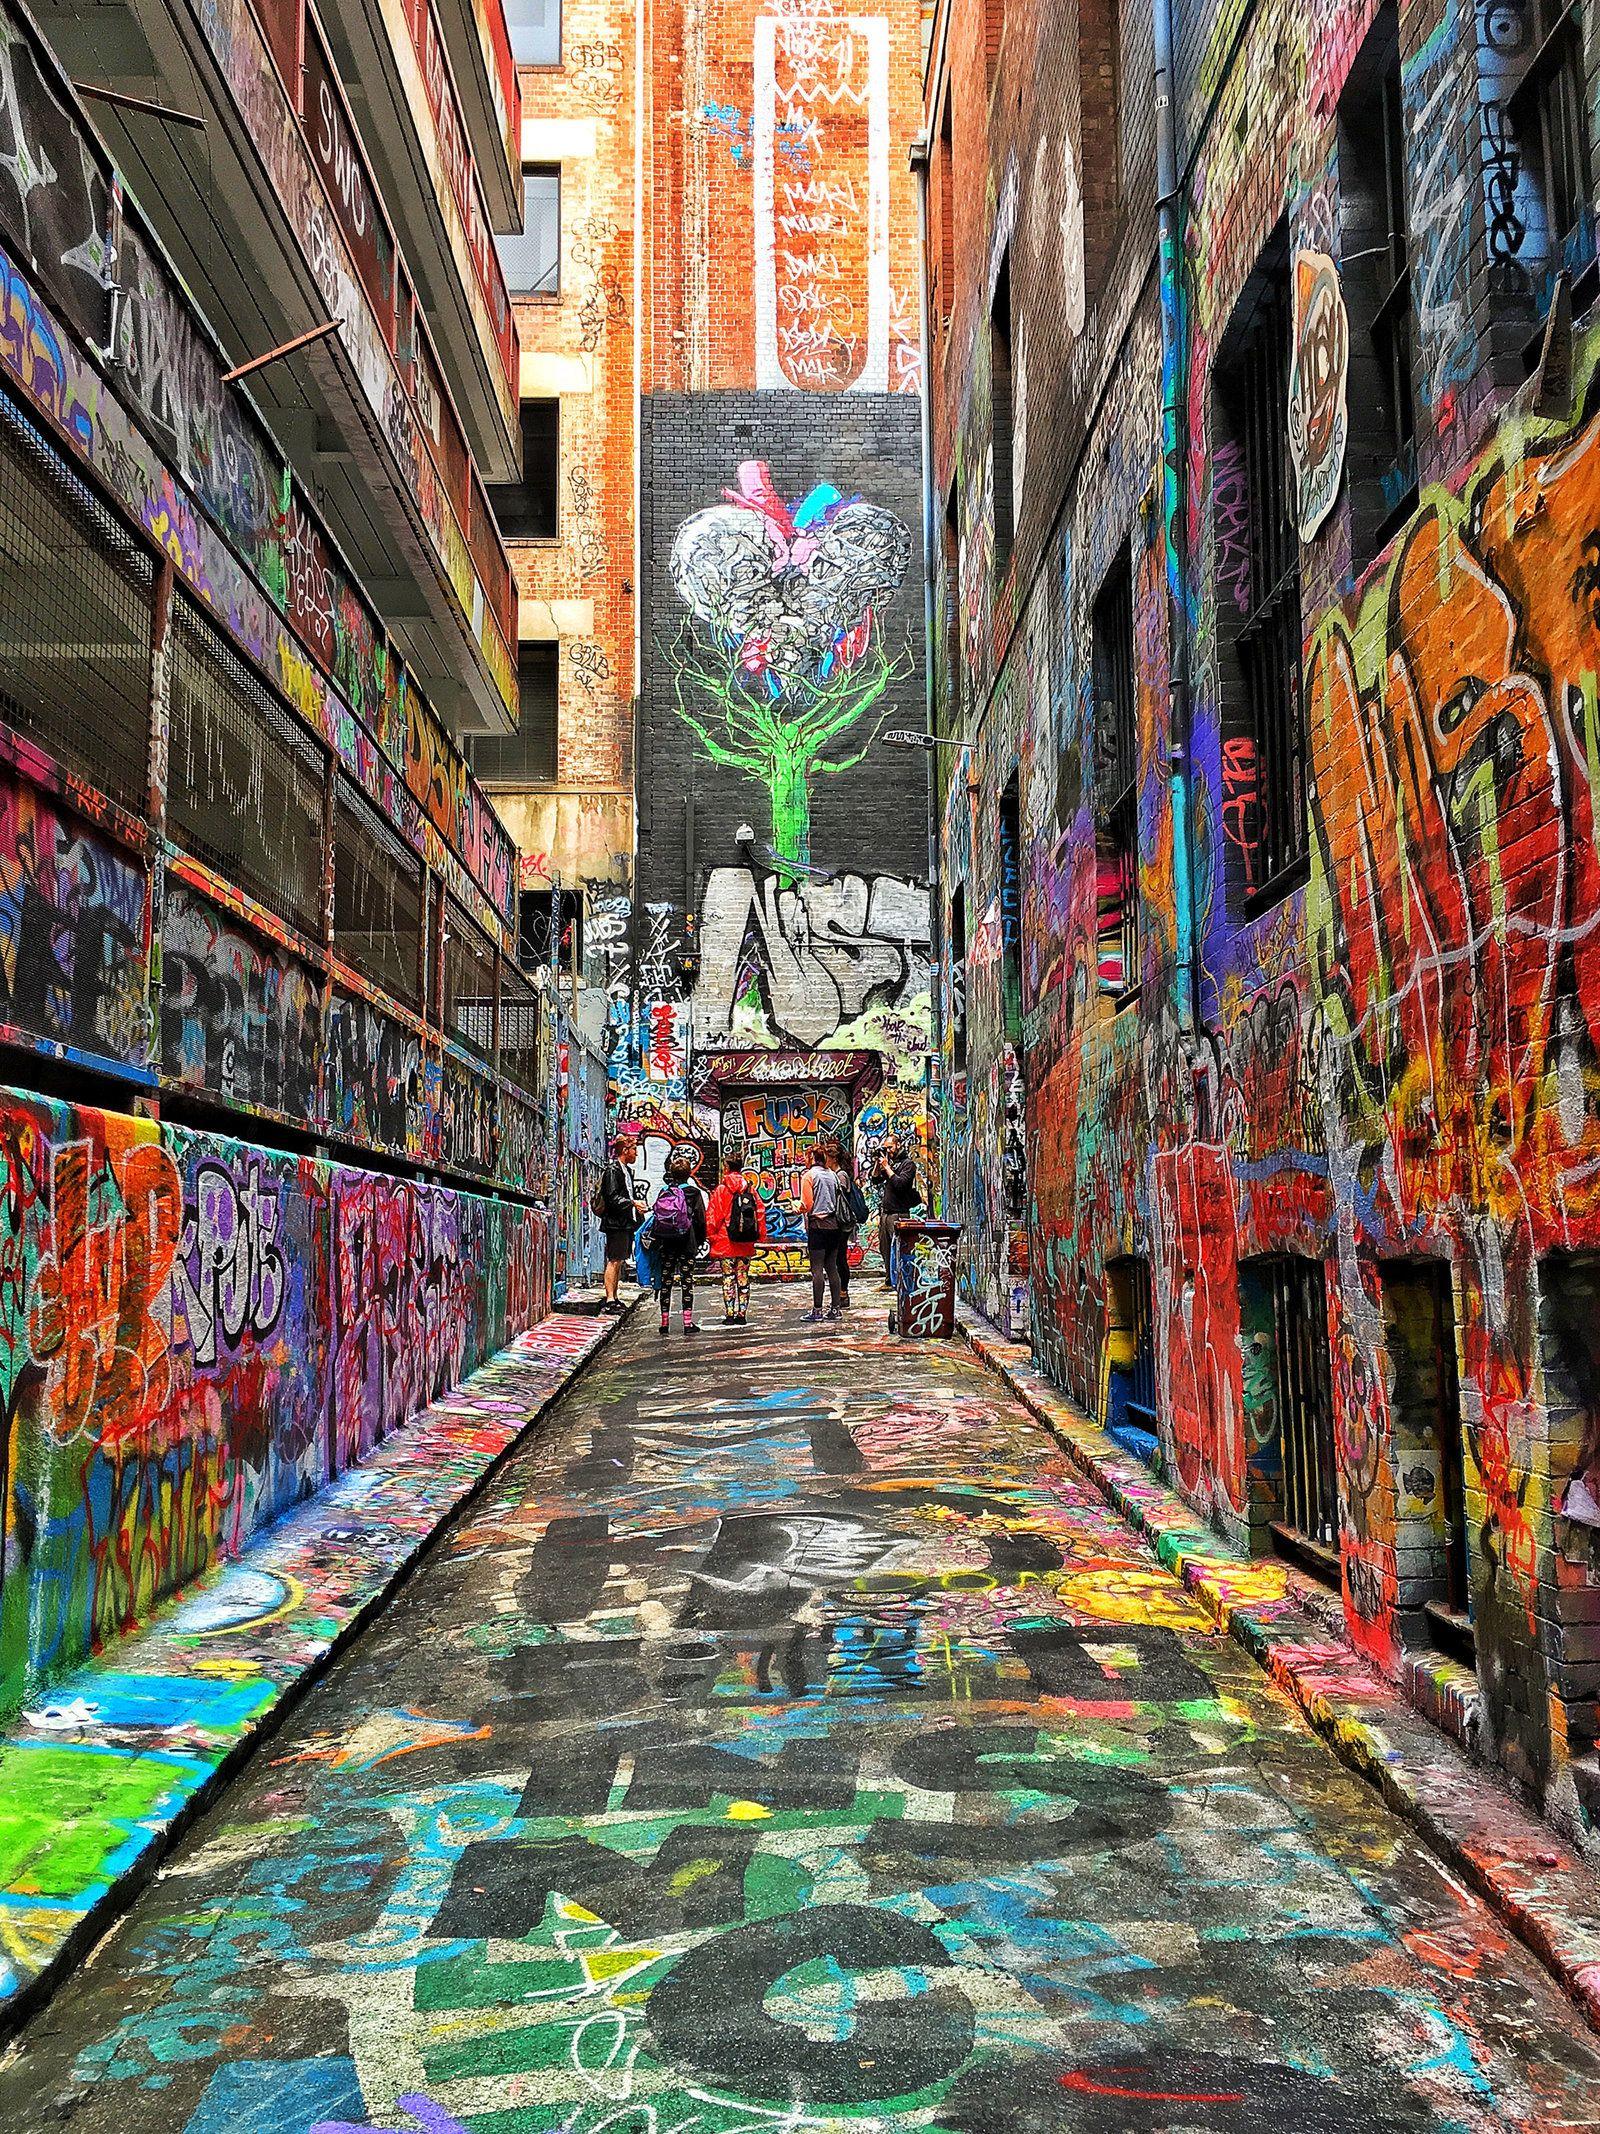 Hosier lane street art courtesy of brianthio